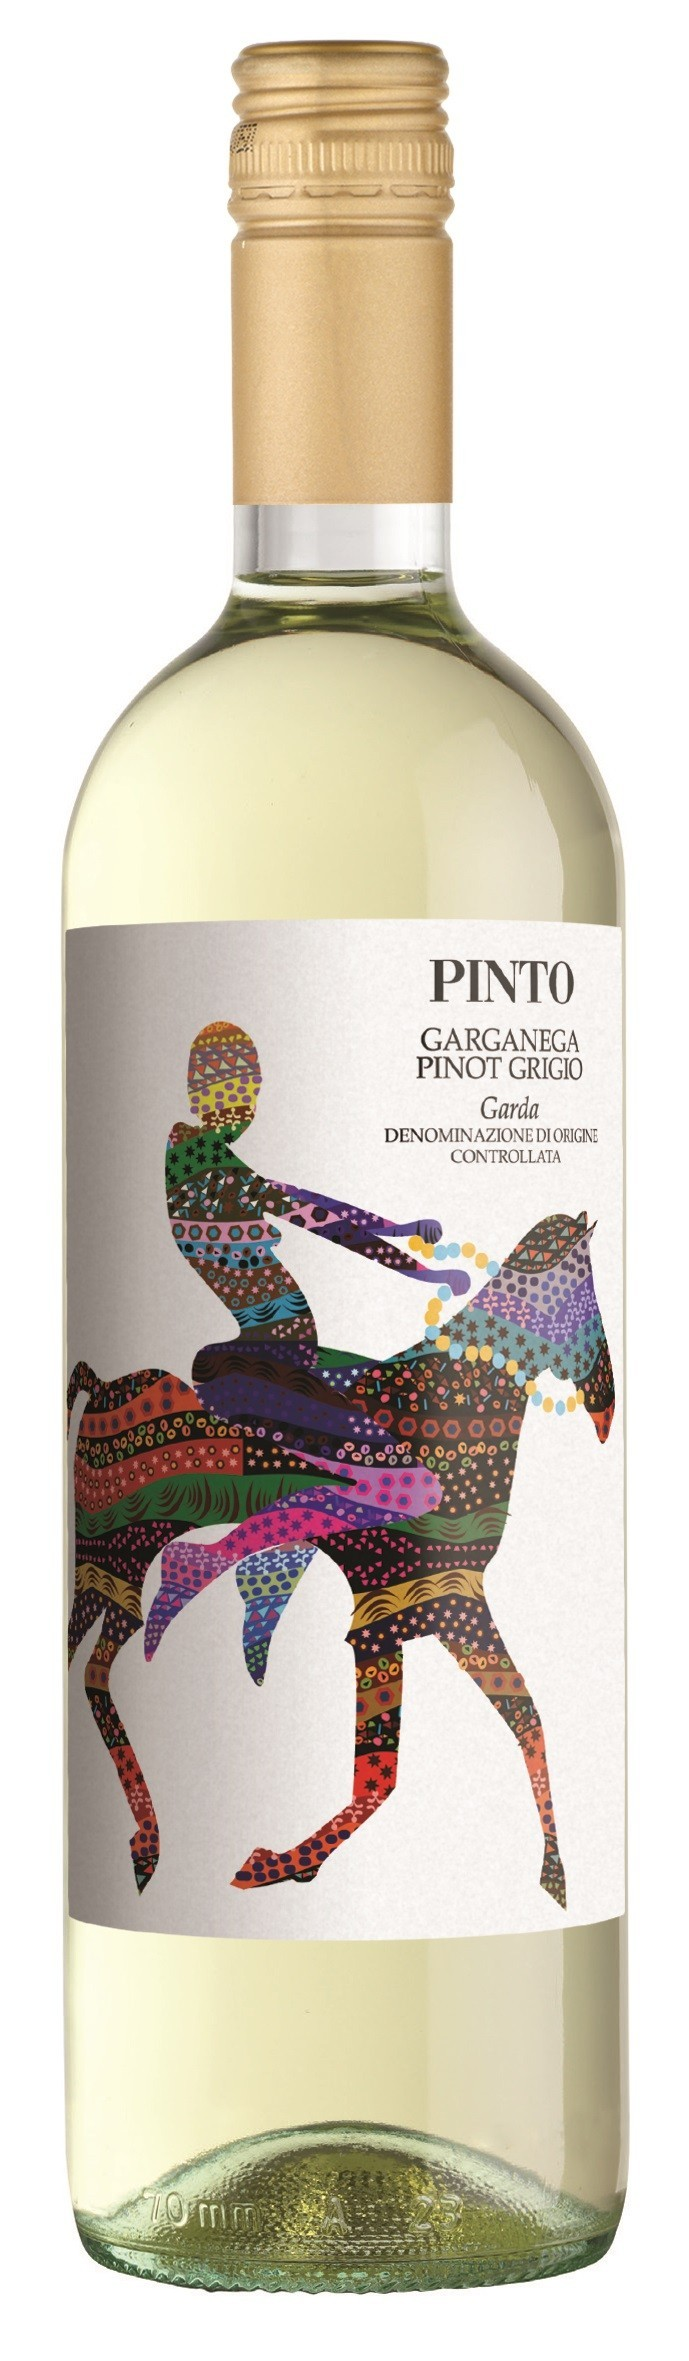 Pinot Grigio PINTO DOC Garganega 2018